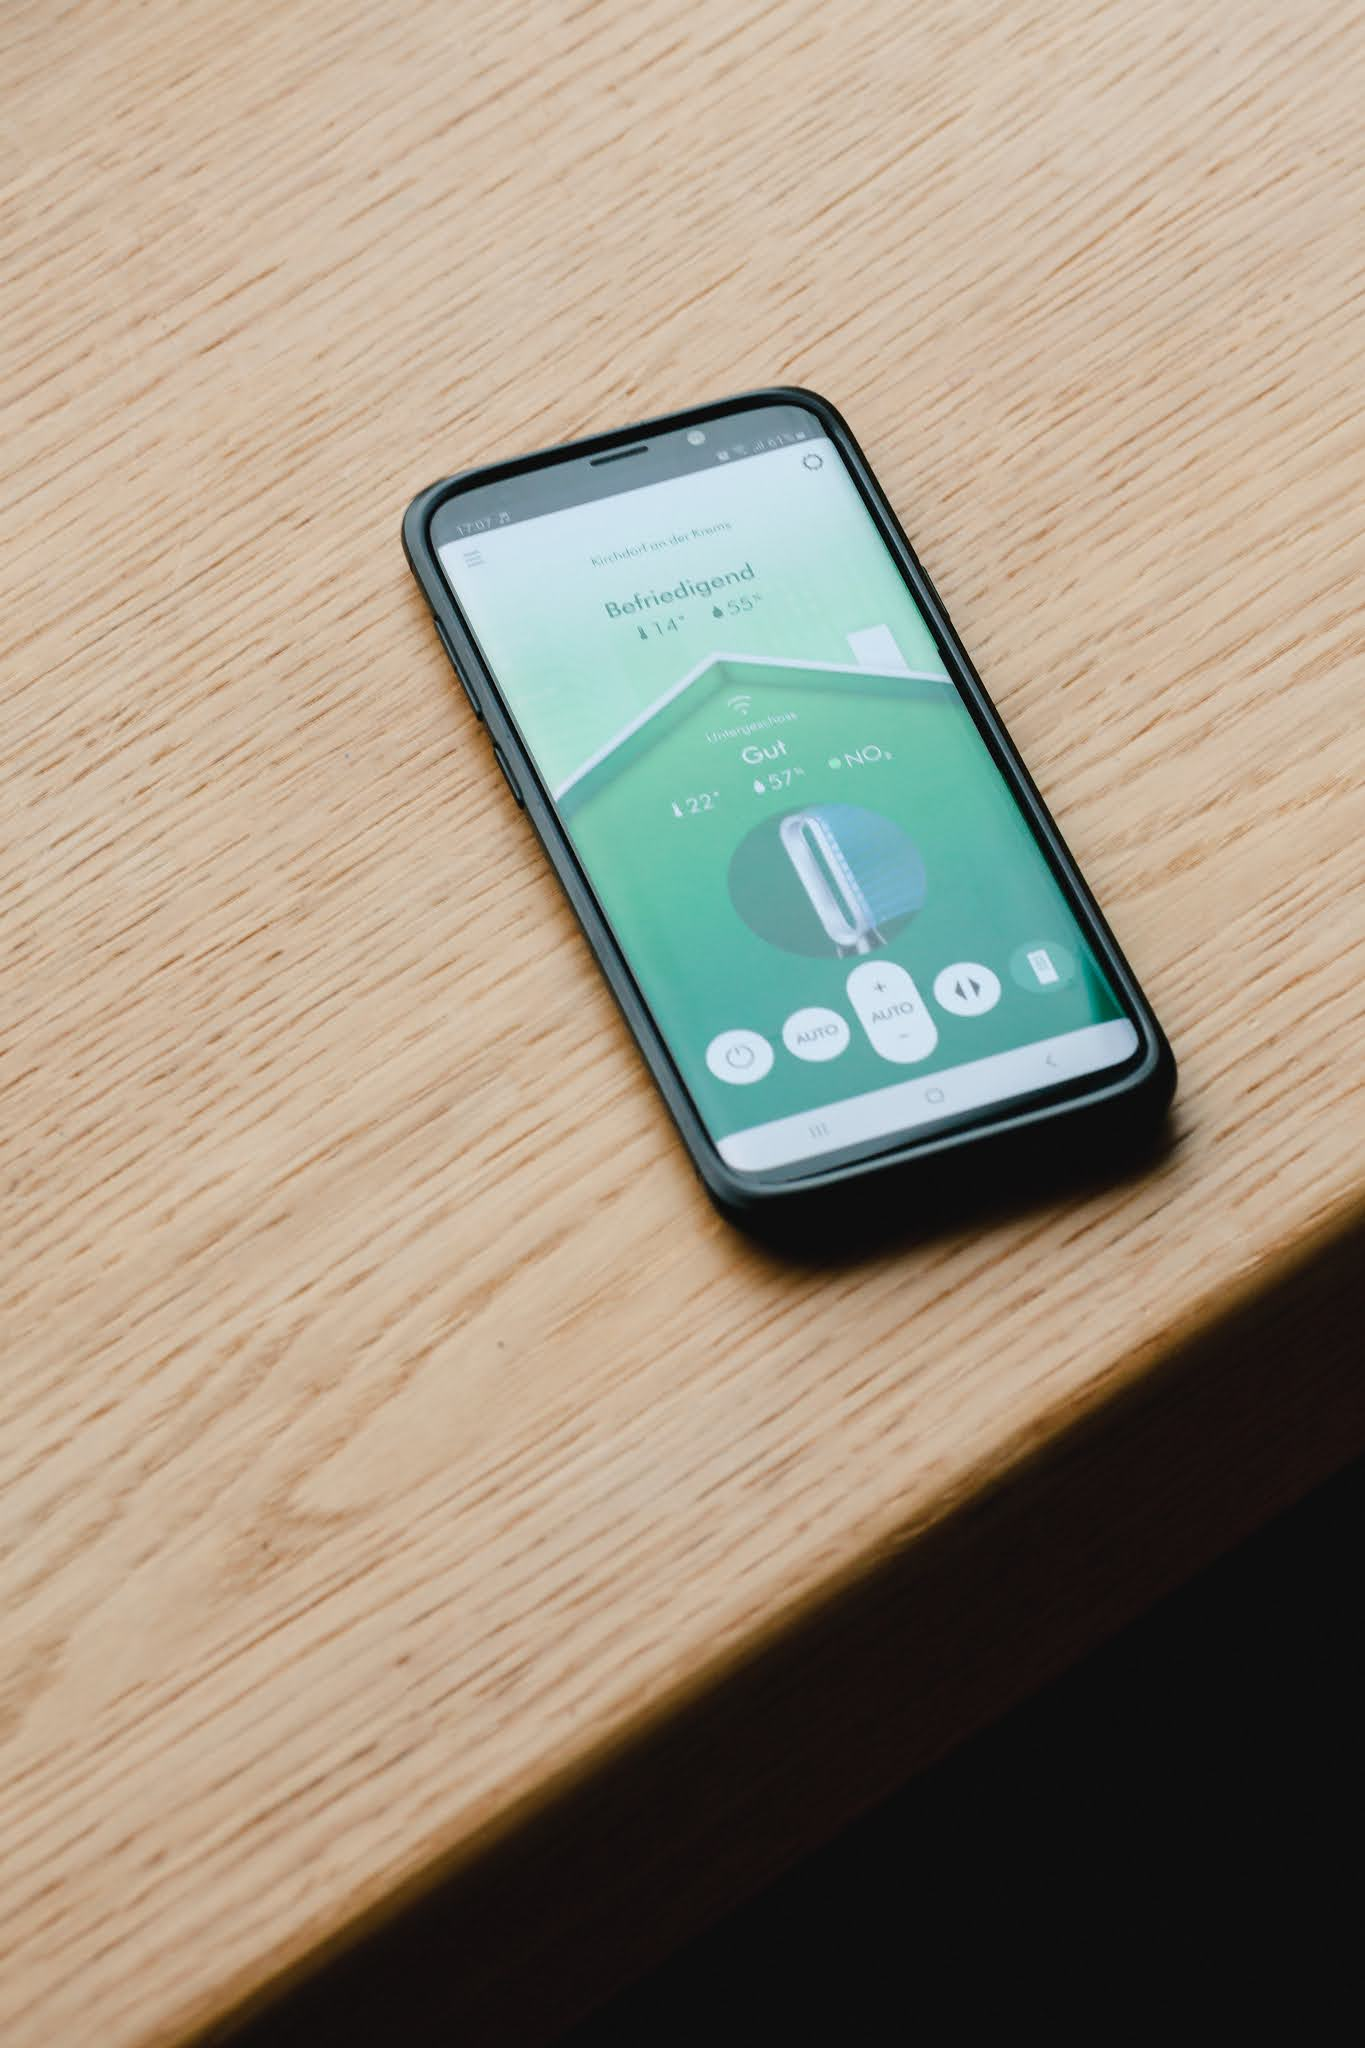 Dyson pure cool per App steuerbar